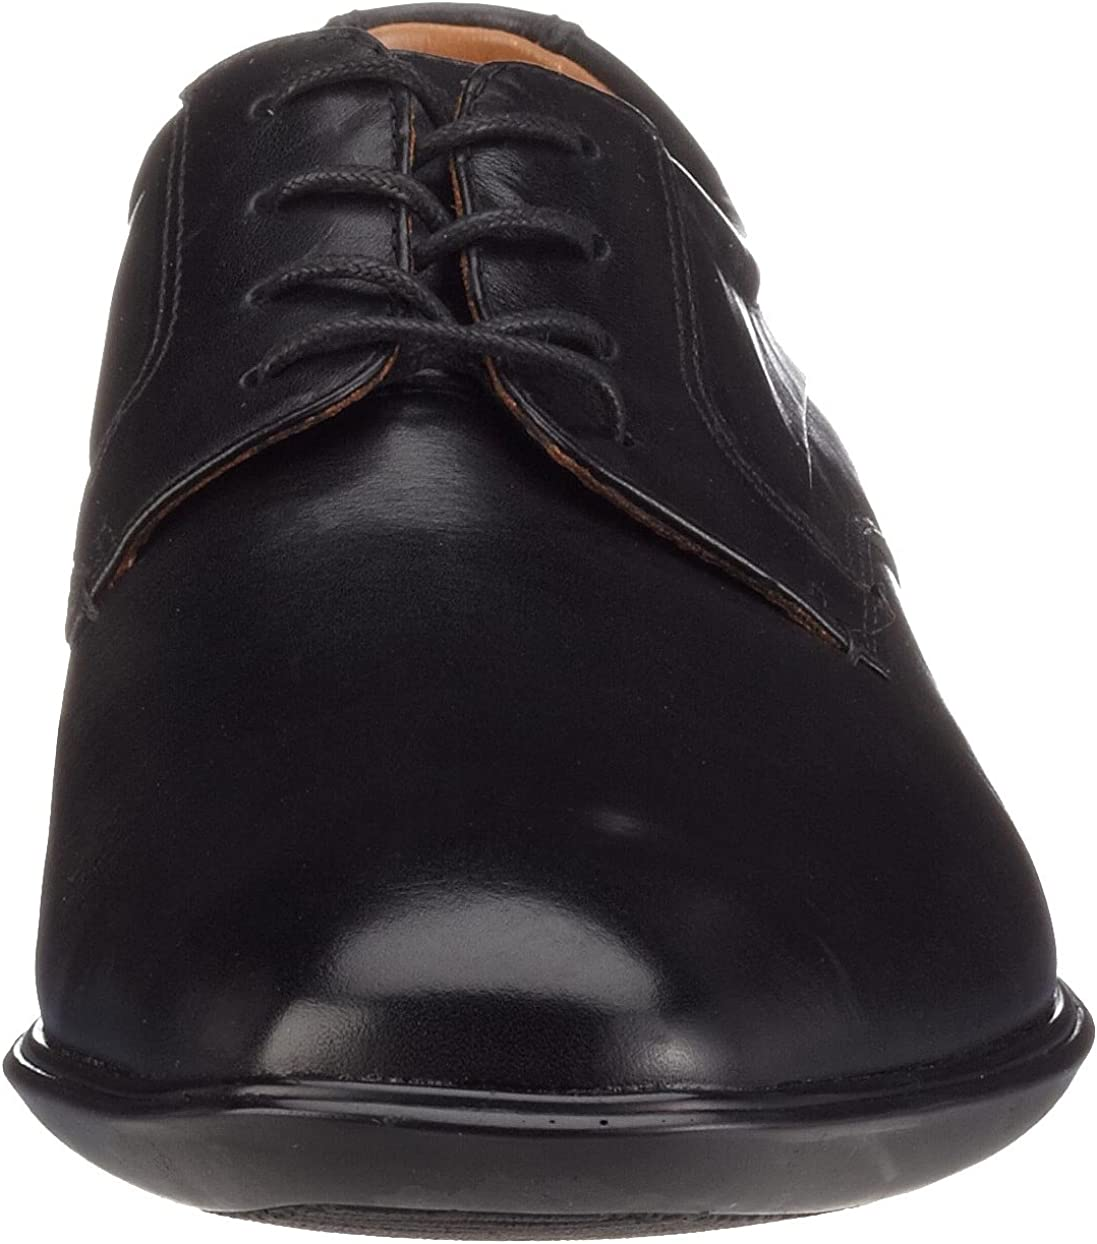 Chaussures de ville homme Clarks Goya Row